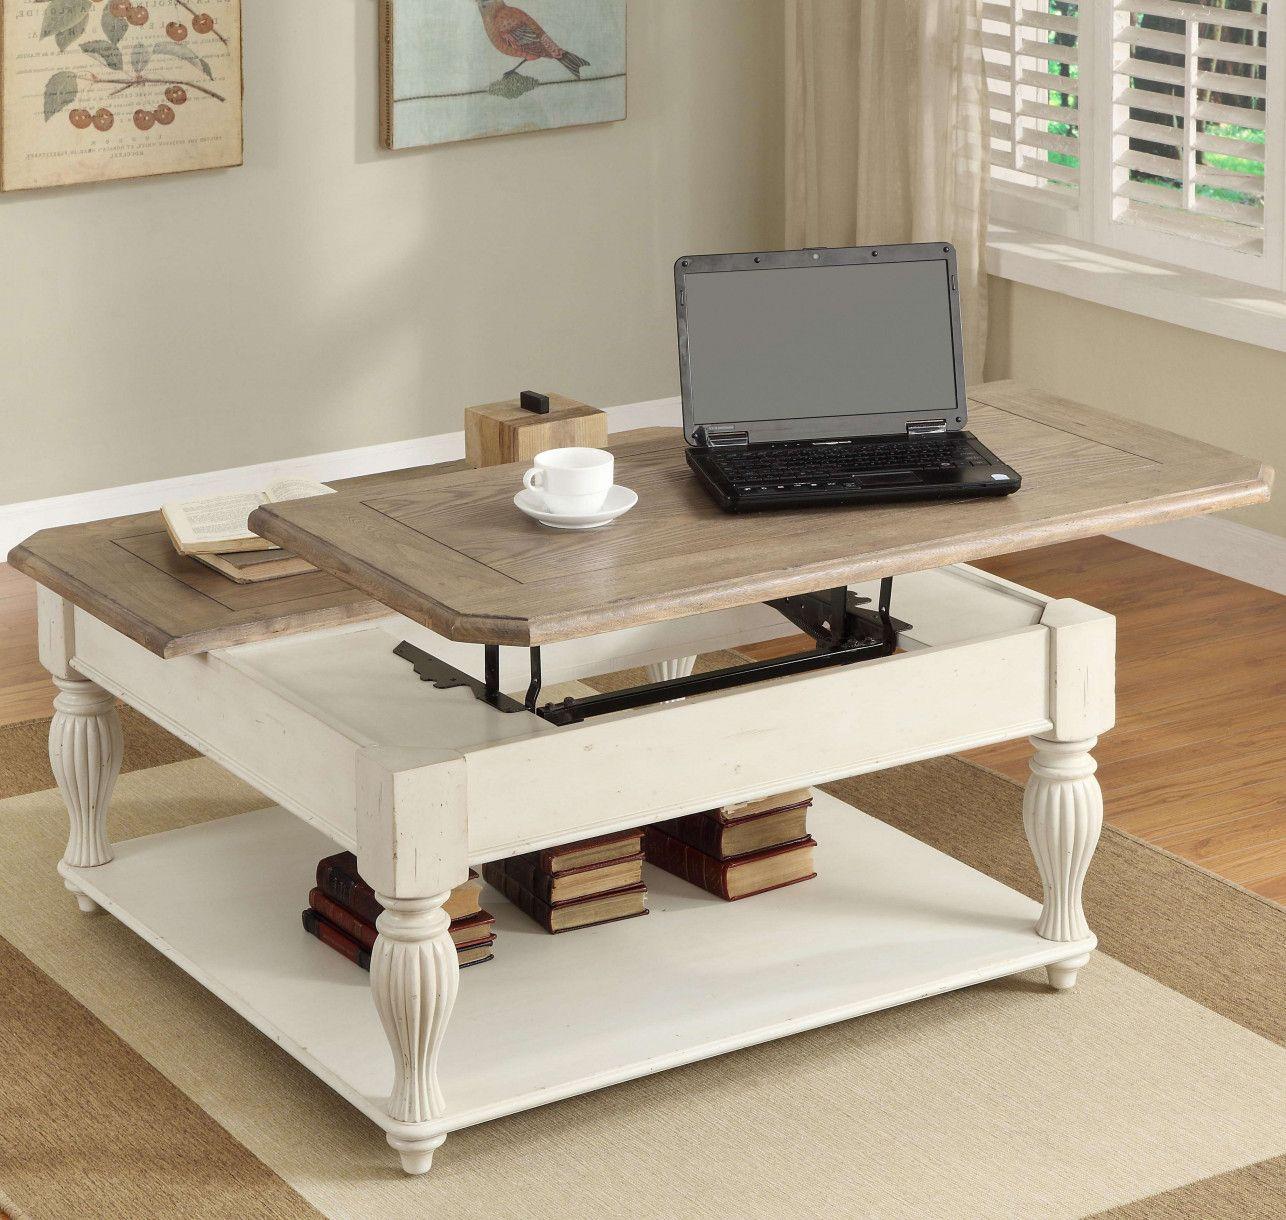 13 Lift Top Coffee Table Tar Wood Lift Top Coffee Table Coffee Table Sectional Coffee Table [ 1220 x 1286 Pixel ]